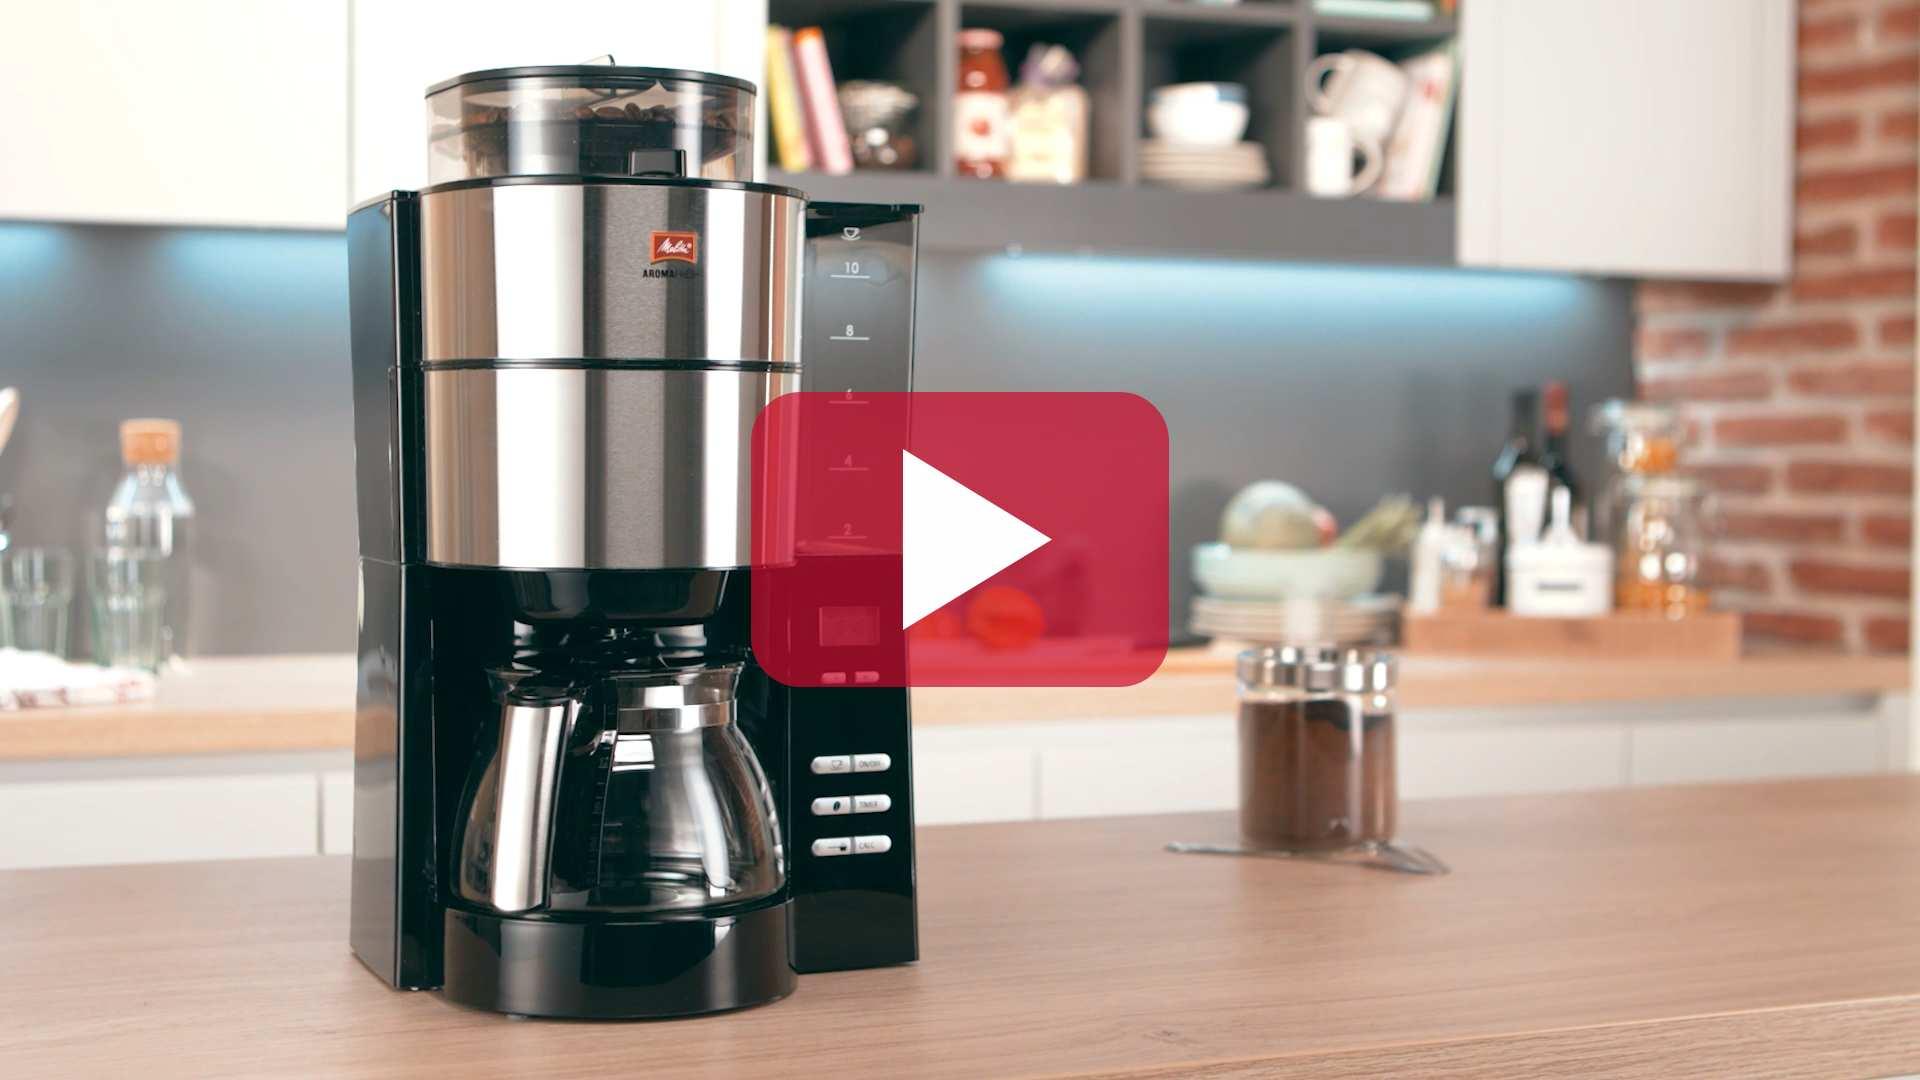 AromaFresh Filterkaffeemaschine Mit Mahlwerk